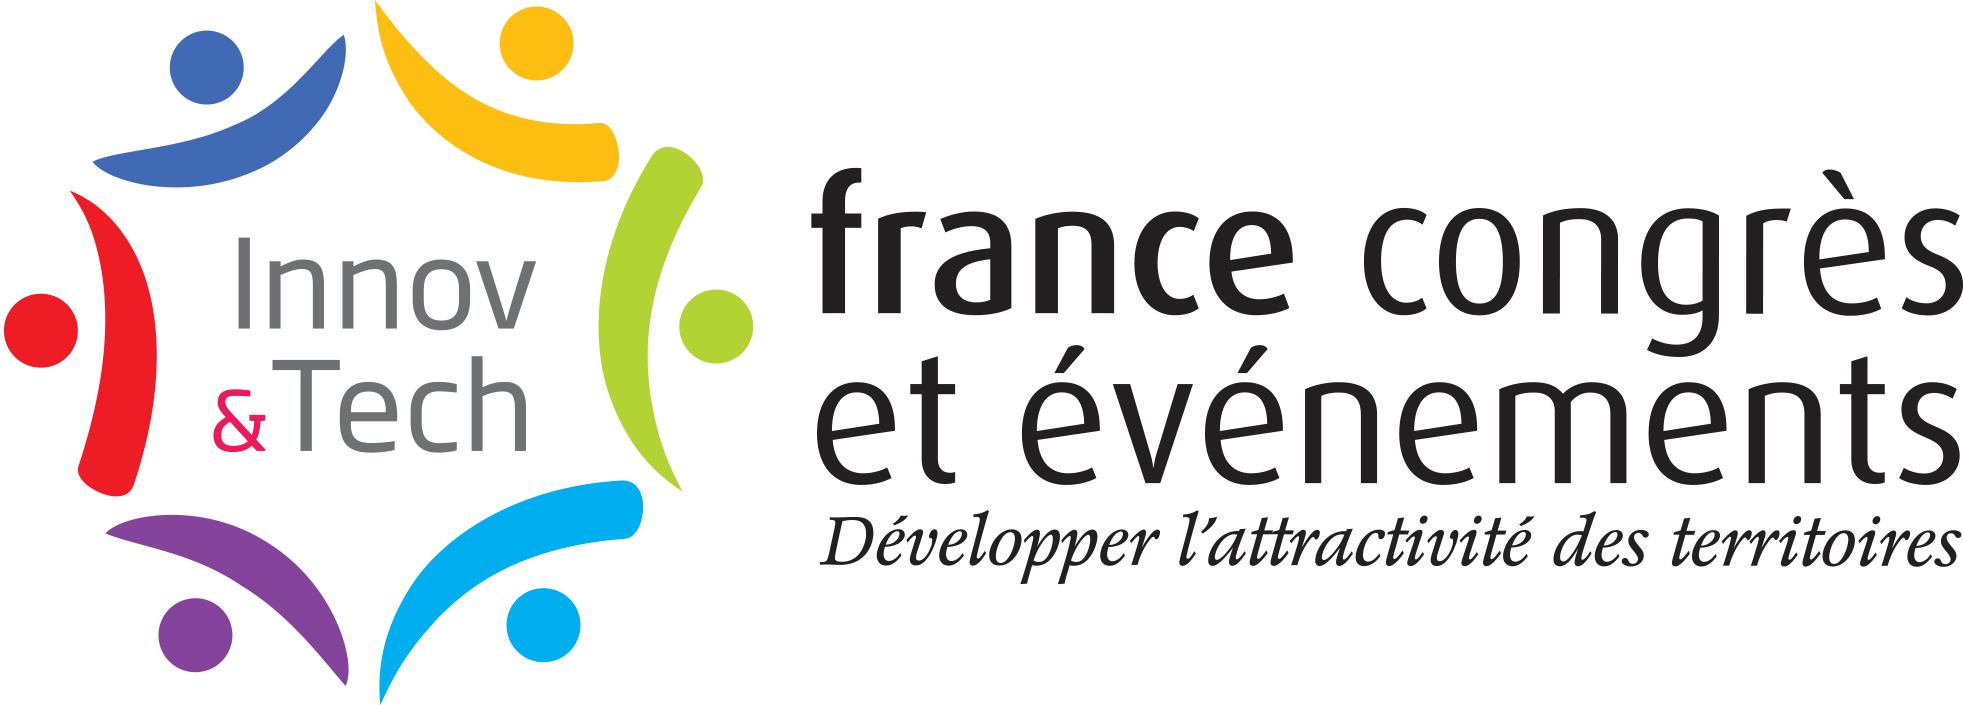 Francecongresnouveaulogo2017cmjnhorizontalinnov1497274478149727447814998557371499855737